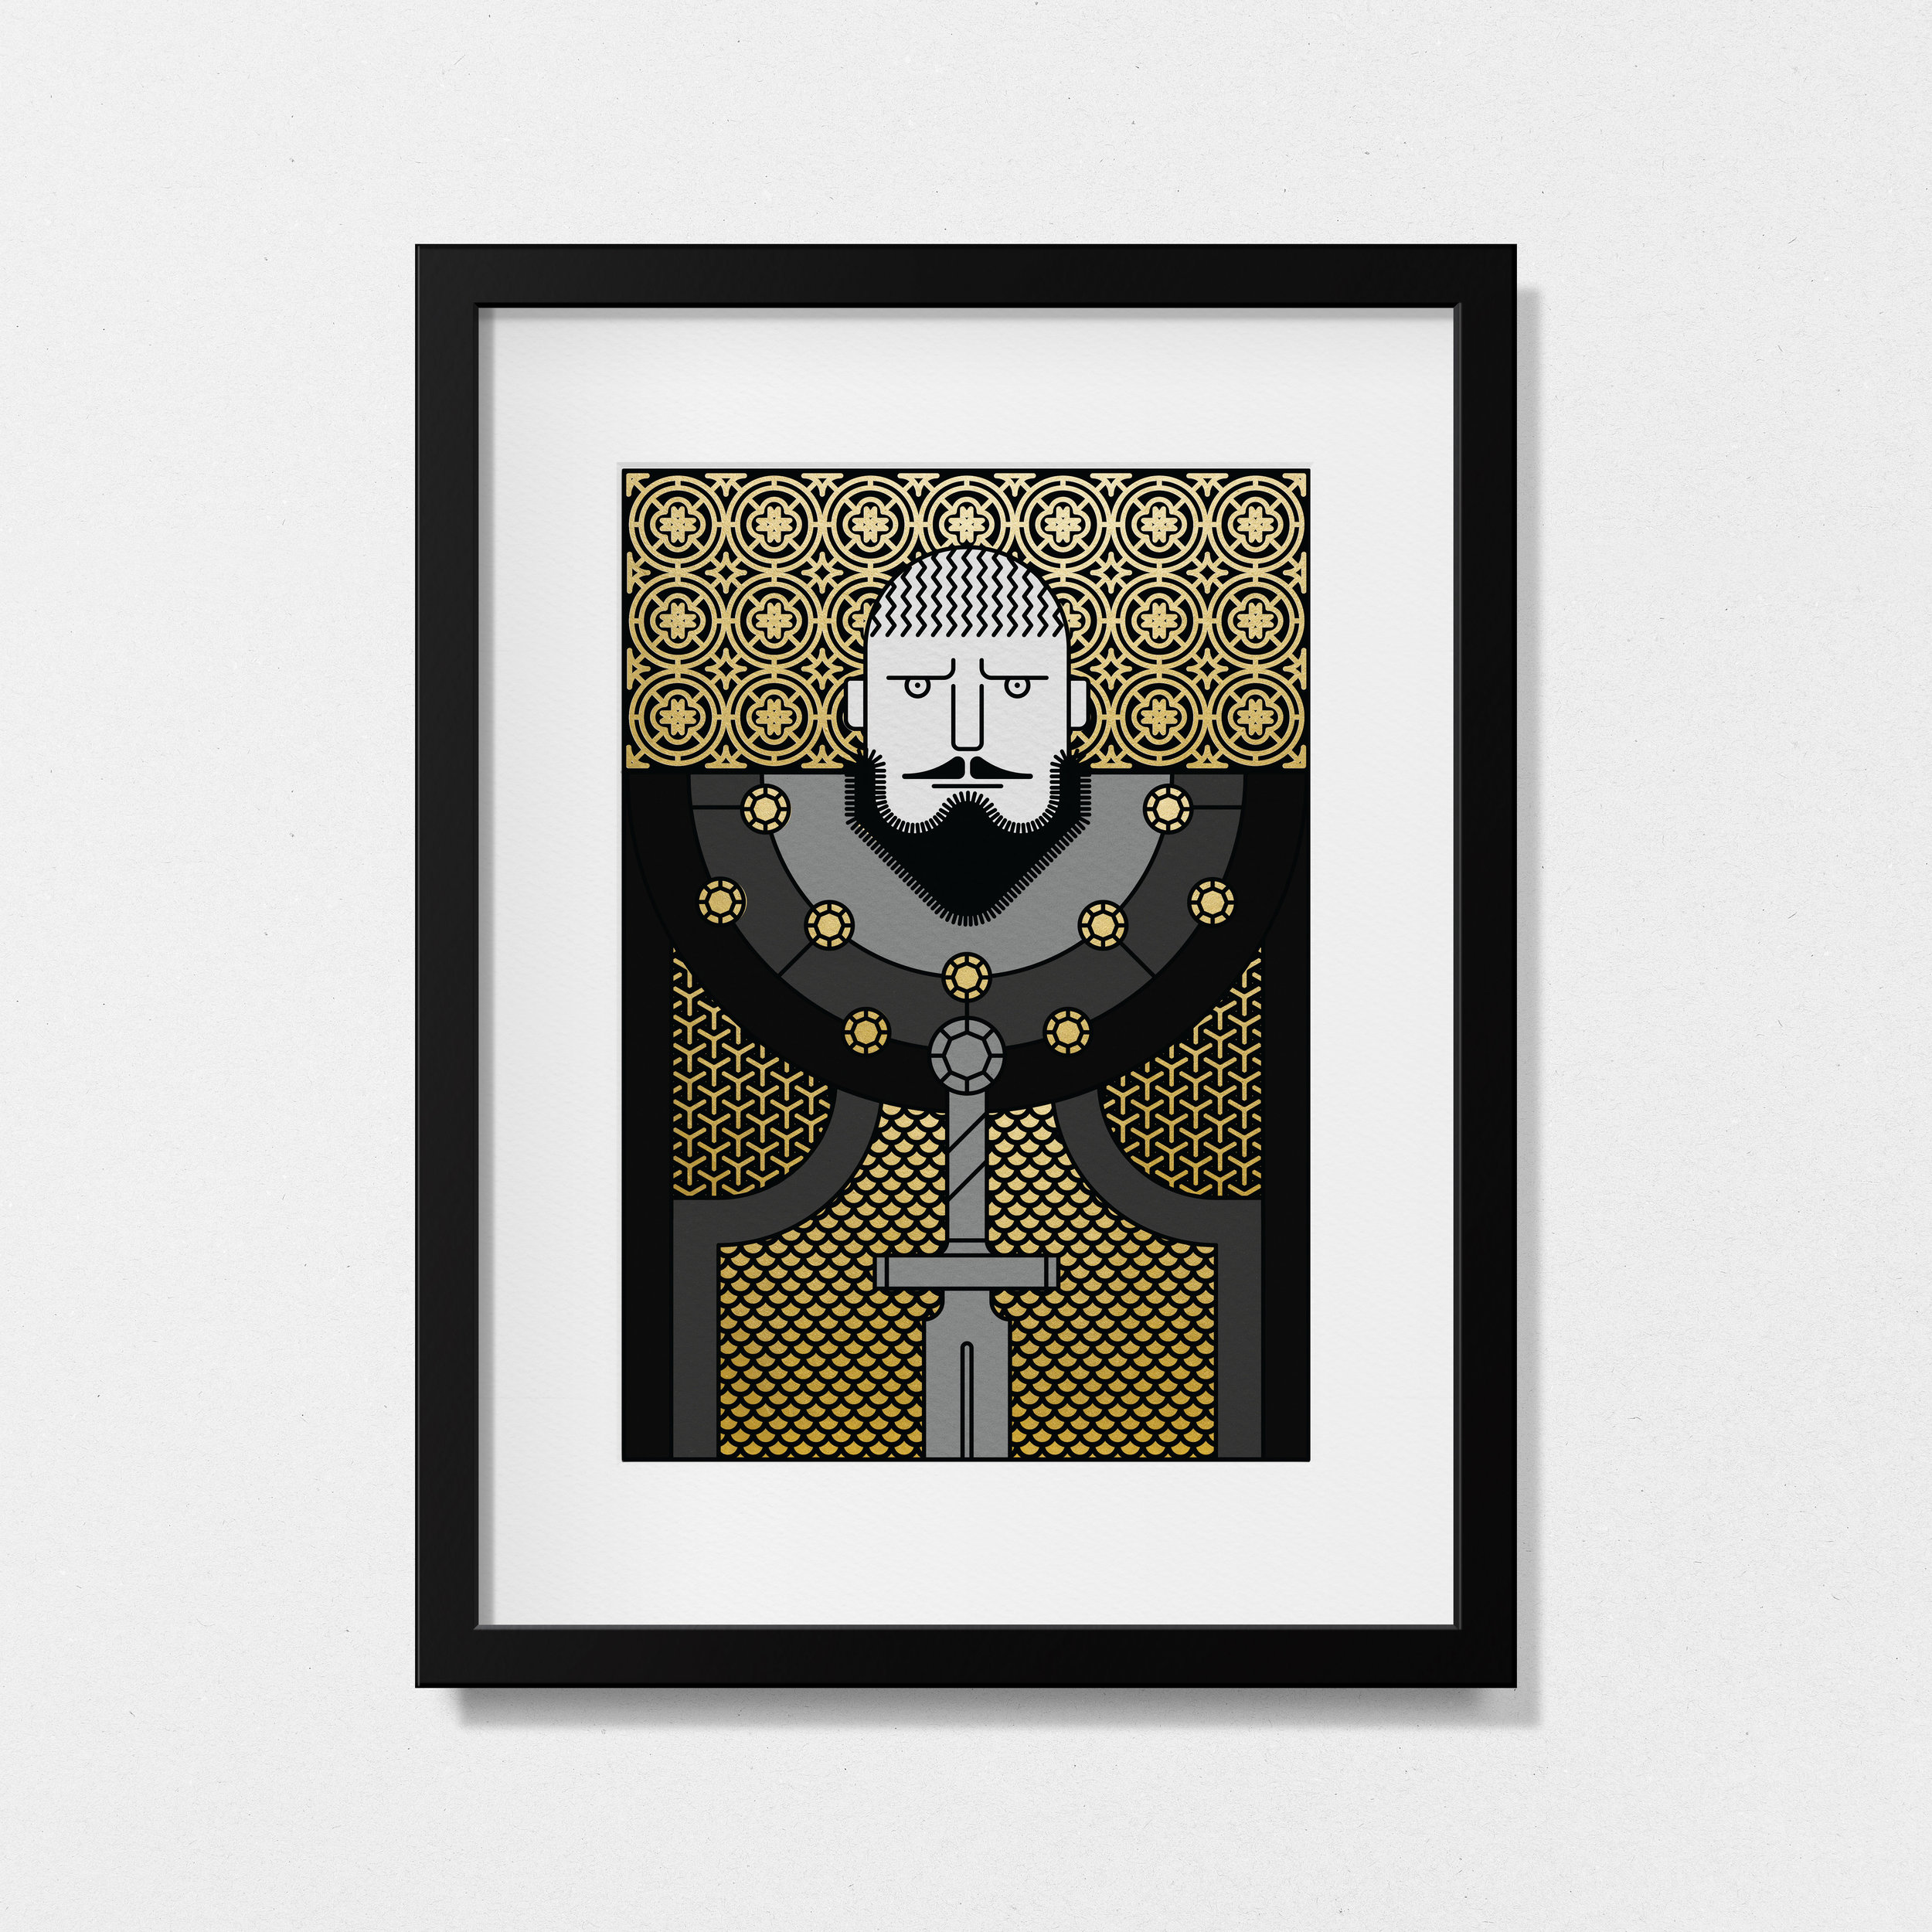 $130 + FREE SHIPPING MACBETH | KING OF SCOTLAND